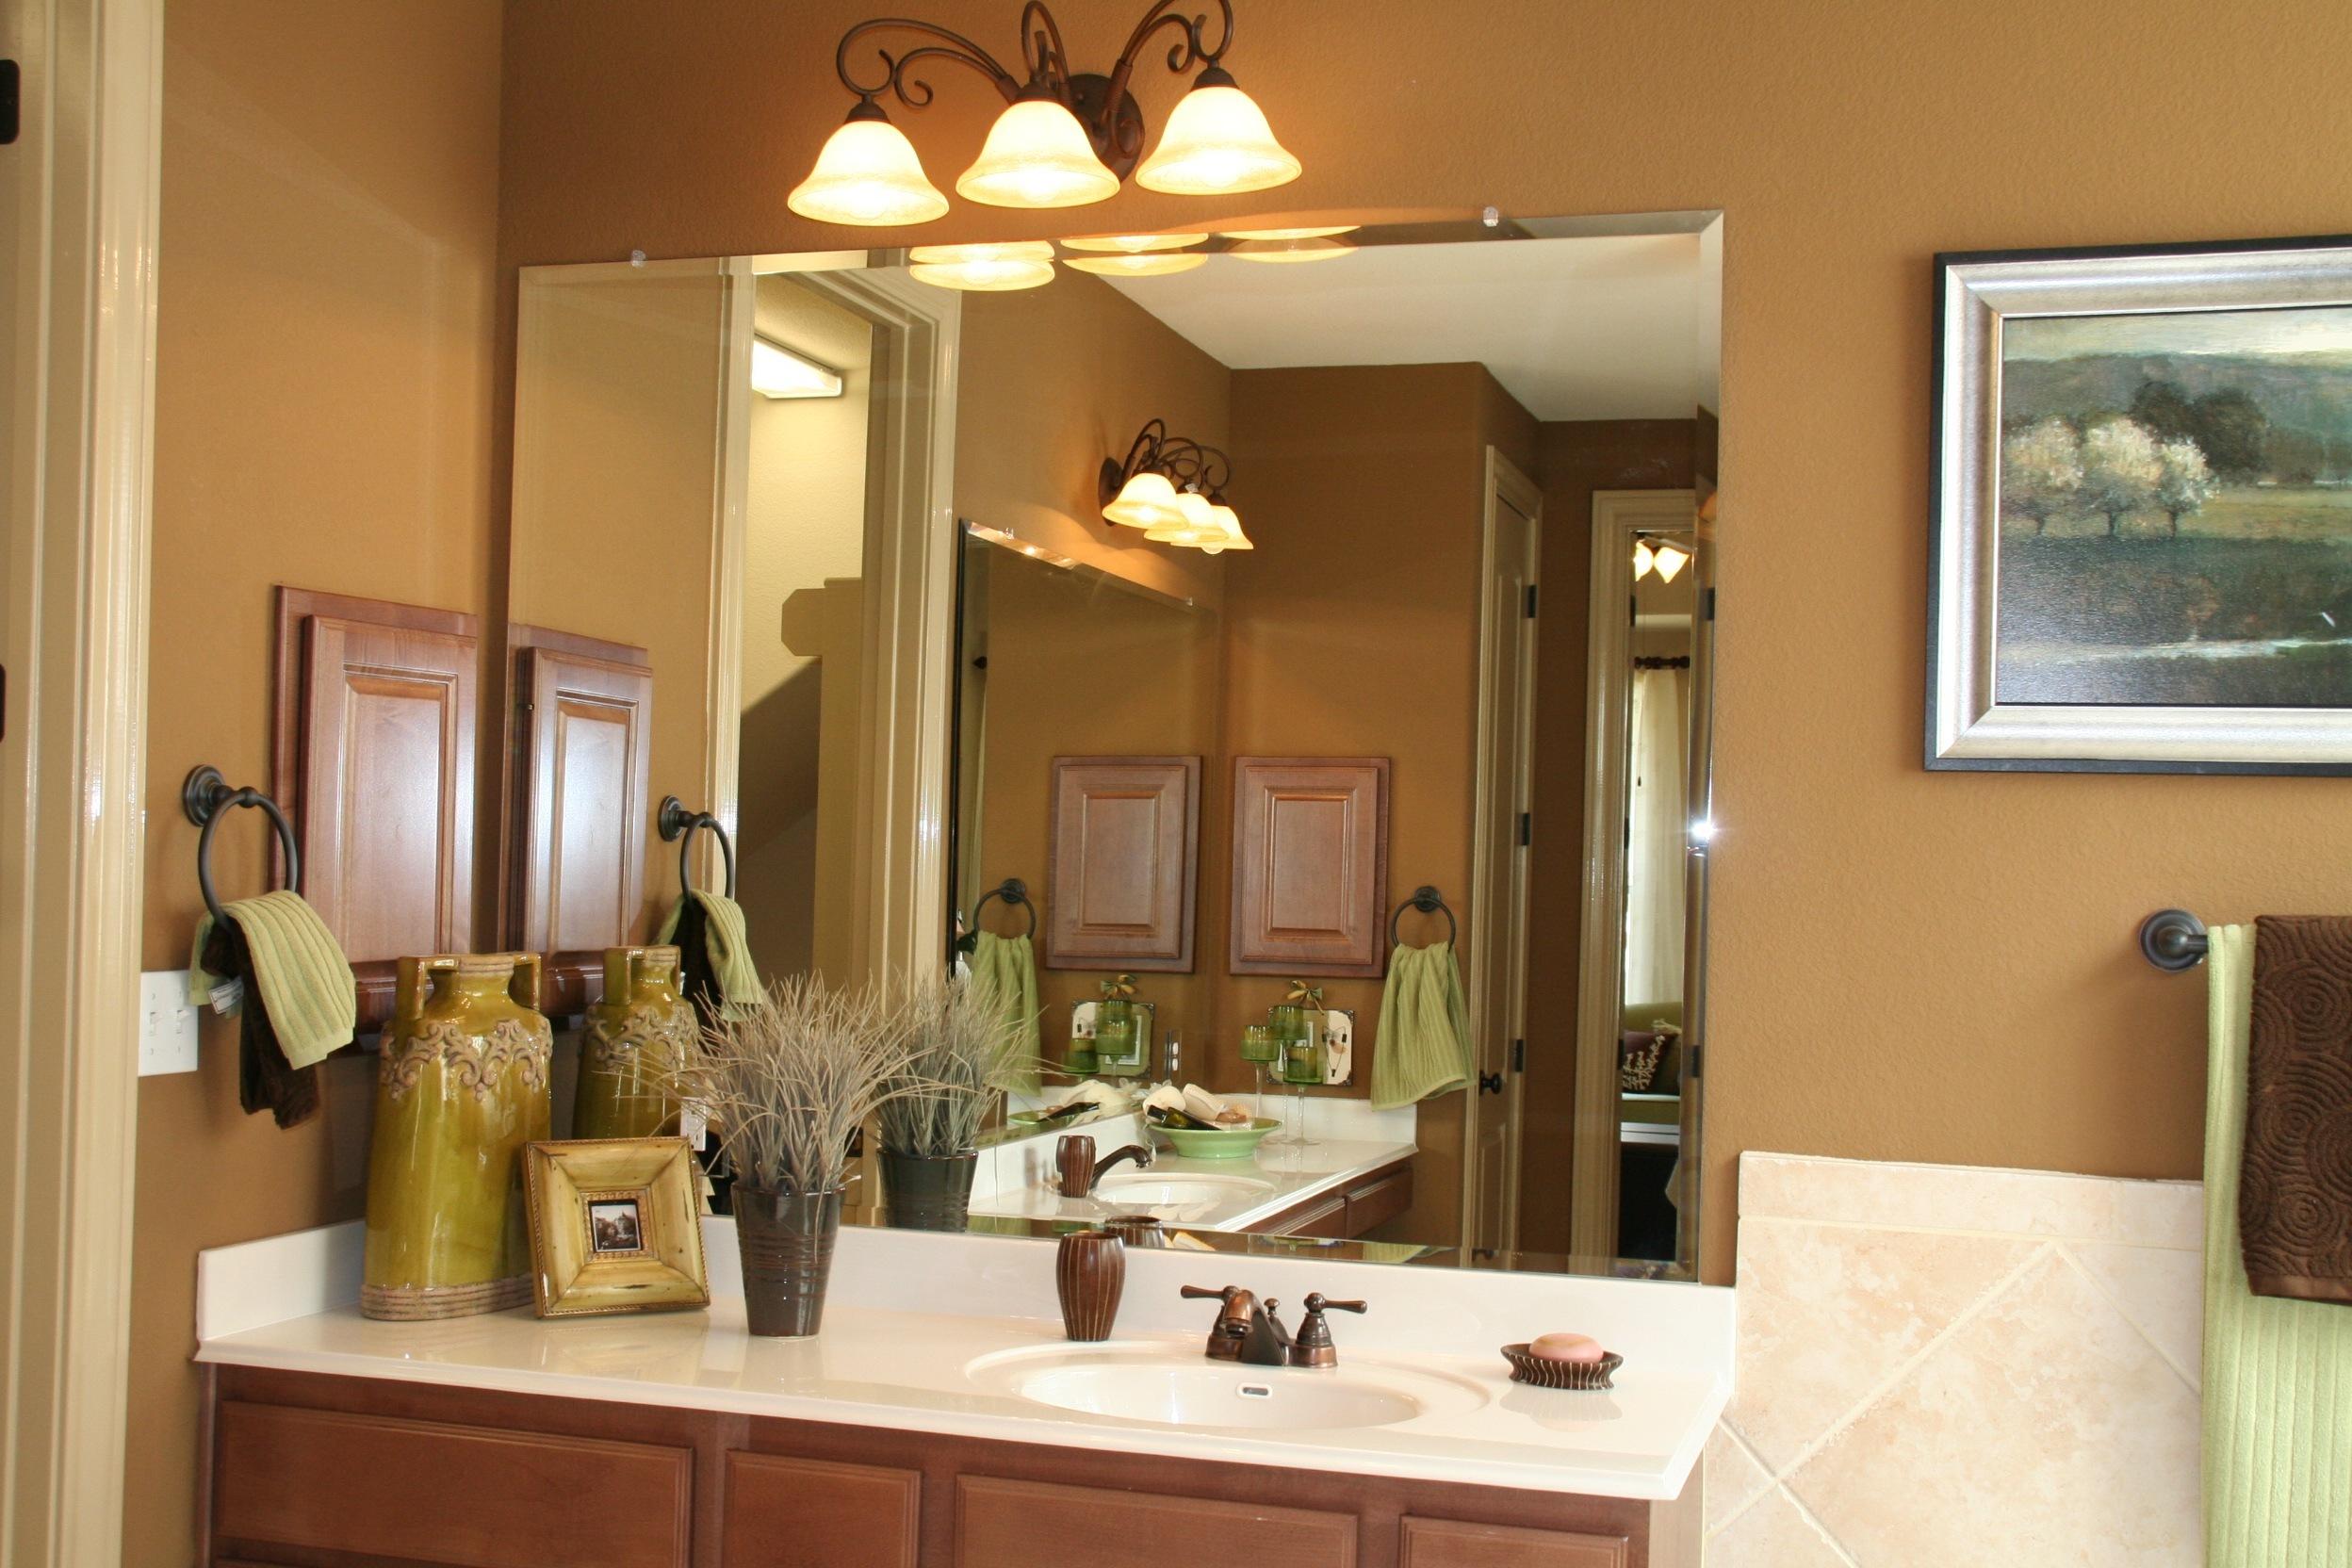 Wall Mirror Beveled Frameless – Mirror Ideas Pertaining To Thornbury Oval Bevel Frameless Wall Mirrors (View 16 of 20)